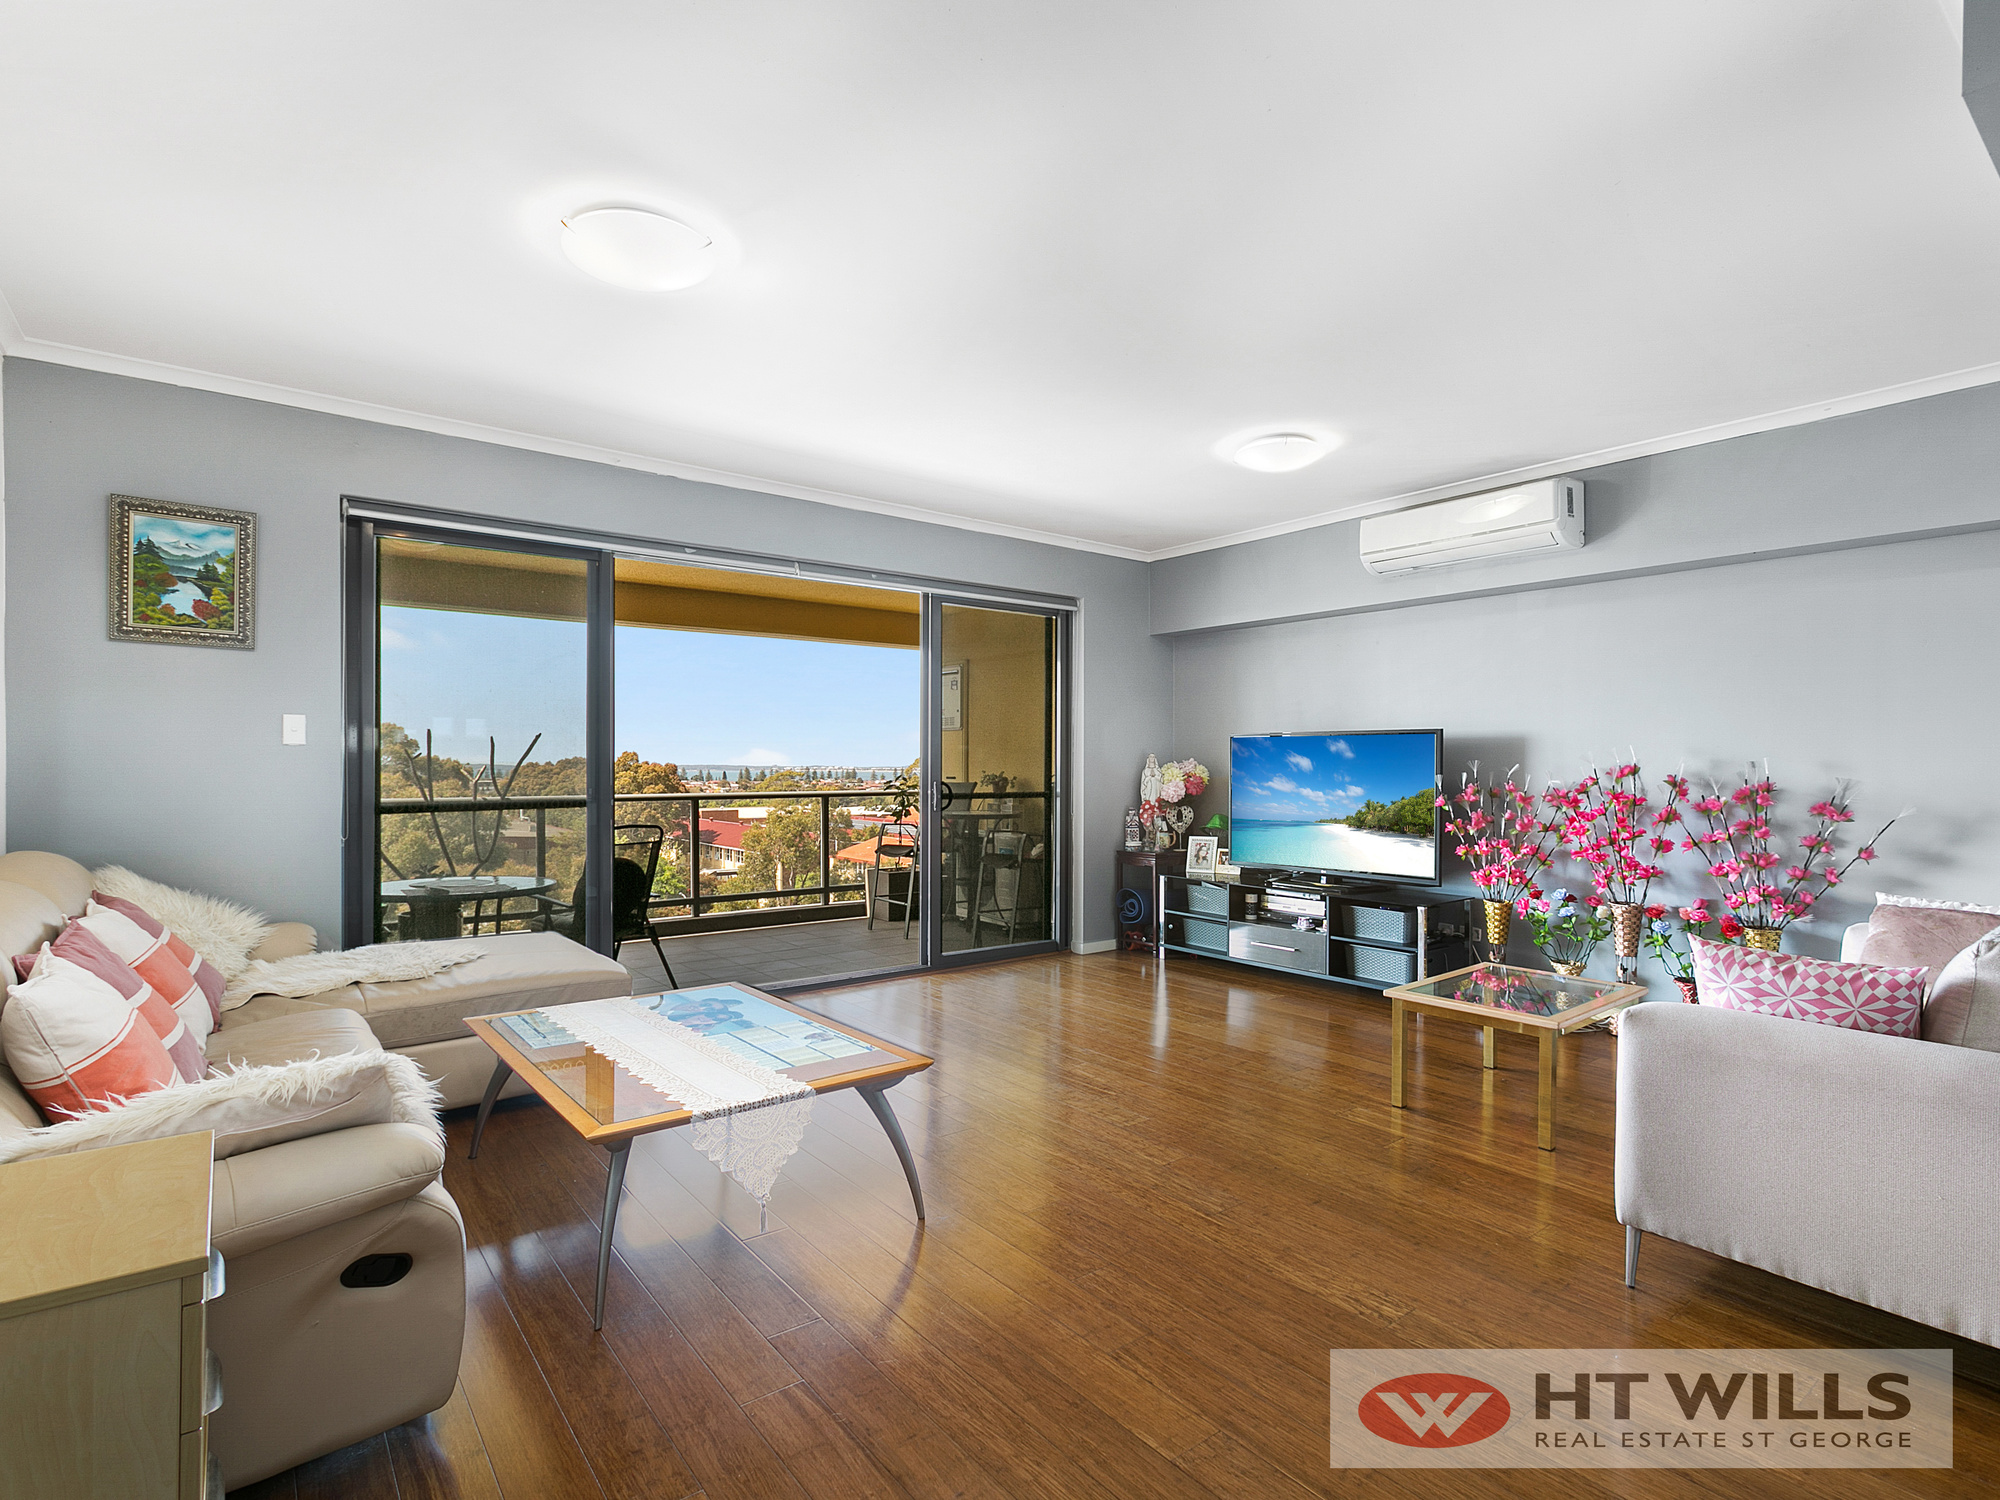 1 Bedroom plus Study room Apartment on level 5